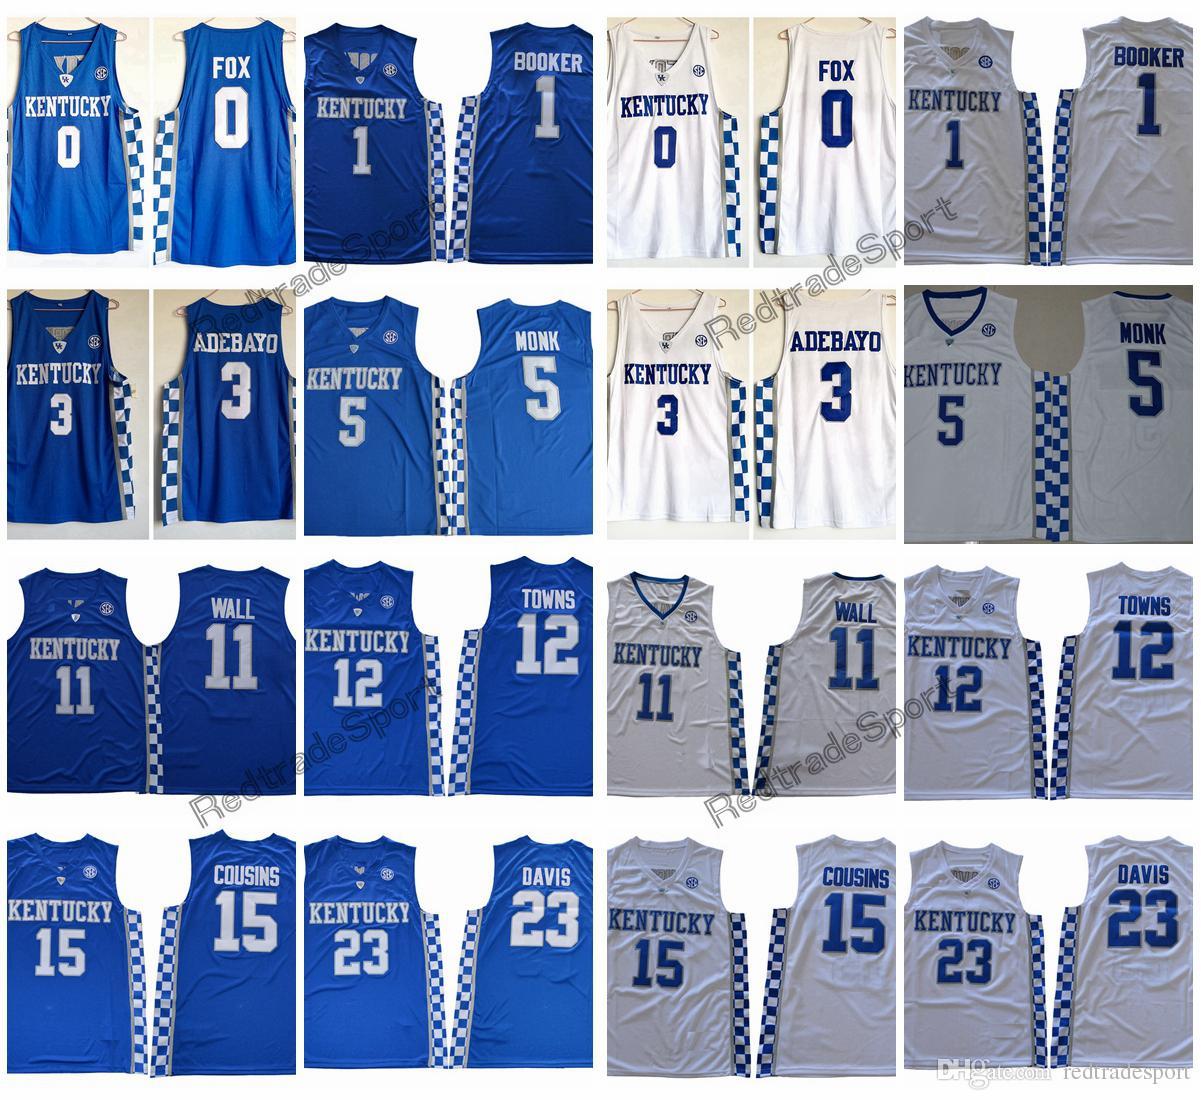 Kentucky Wildcats 5 Malik Monk 3 Adebayo 0 Fox 1 Devin Booker 11 John Wall  12 Towns 15 Cousins 23 Anthony Davis College Basketball Jersey John Wall  Jersey ... 825e2f14e